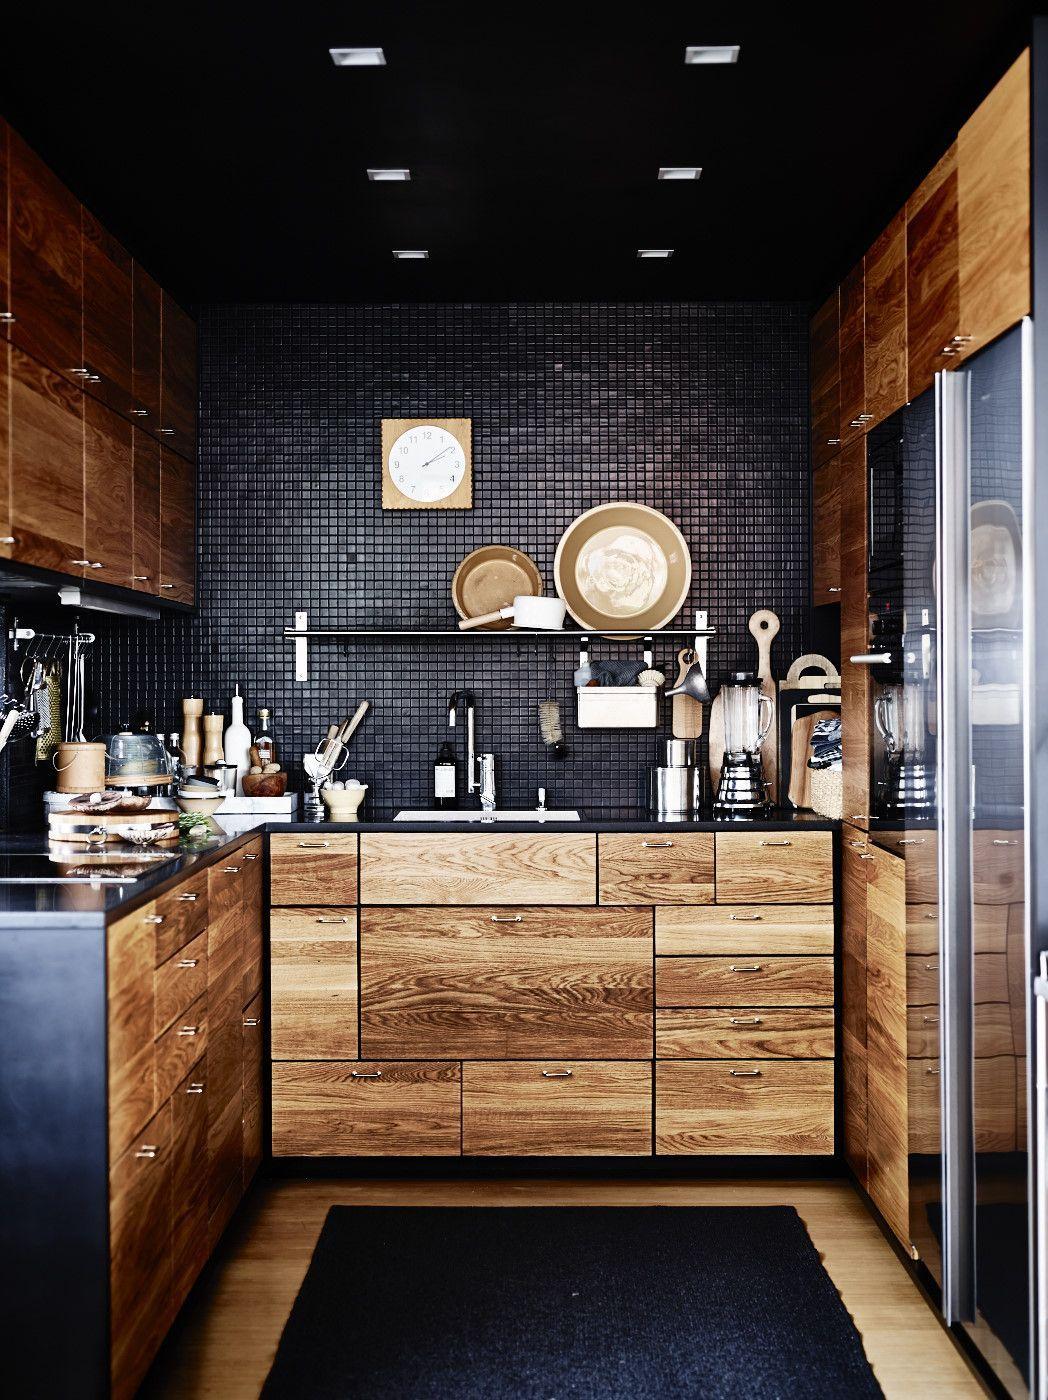 53 Stylish Black Kitchen Designs  Black Kitchens January 27 And Prepossessing Cool Kitchen Designs Design Decoration